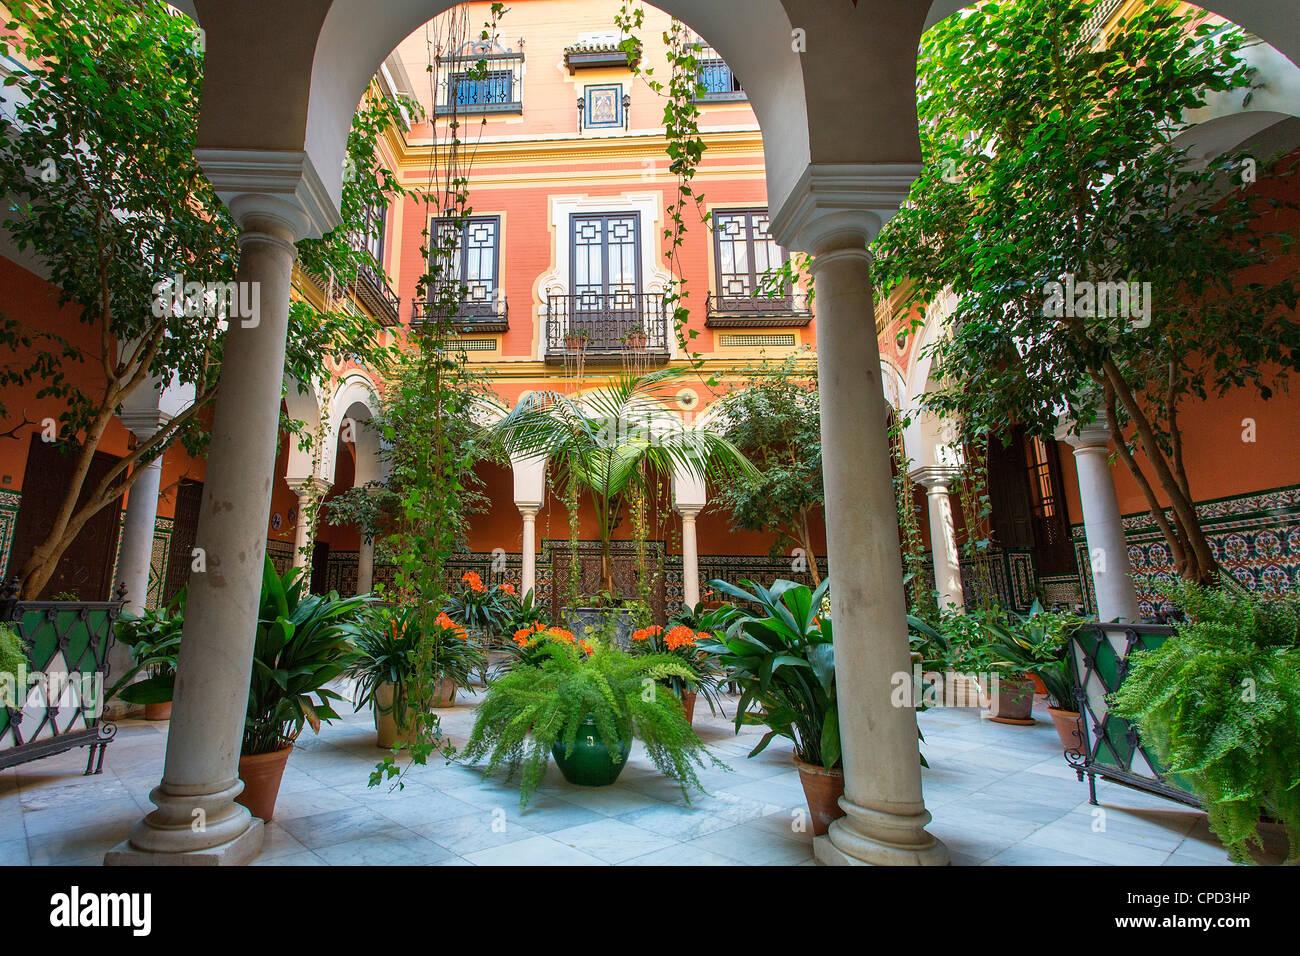 Europa, Spanien Andalusien, Sevilla, Patio im Viertel Santa Cruz Stockbild